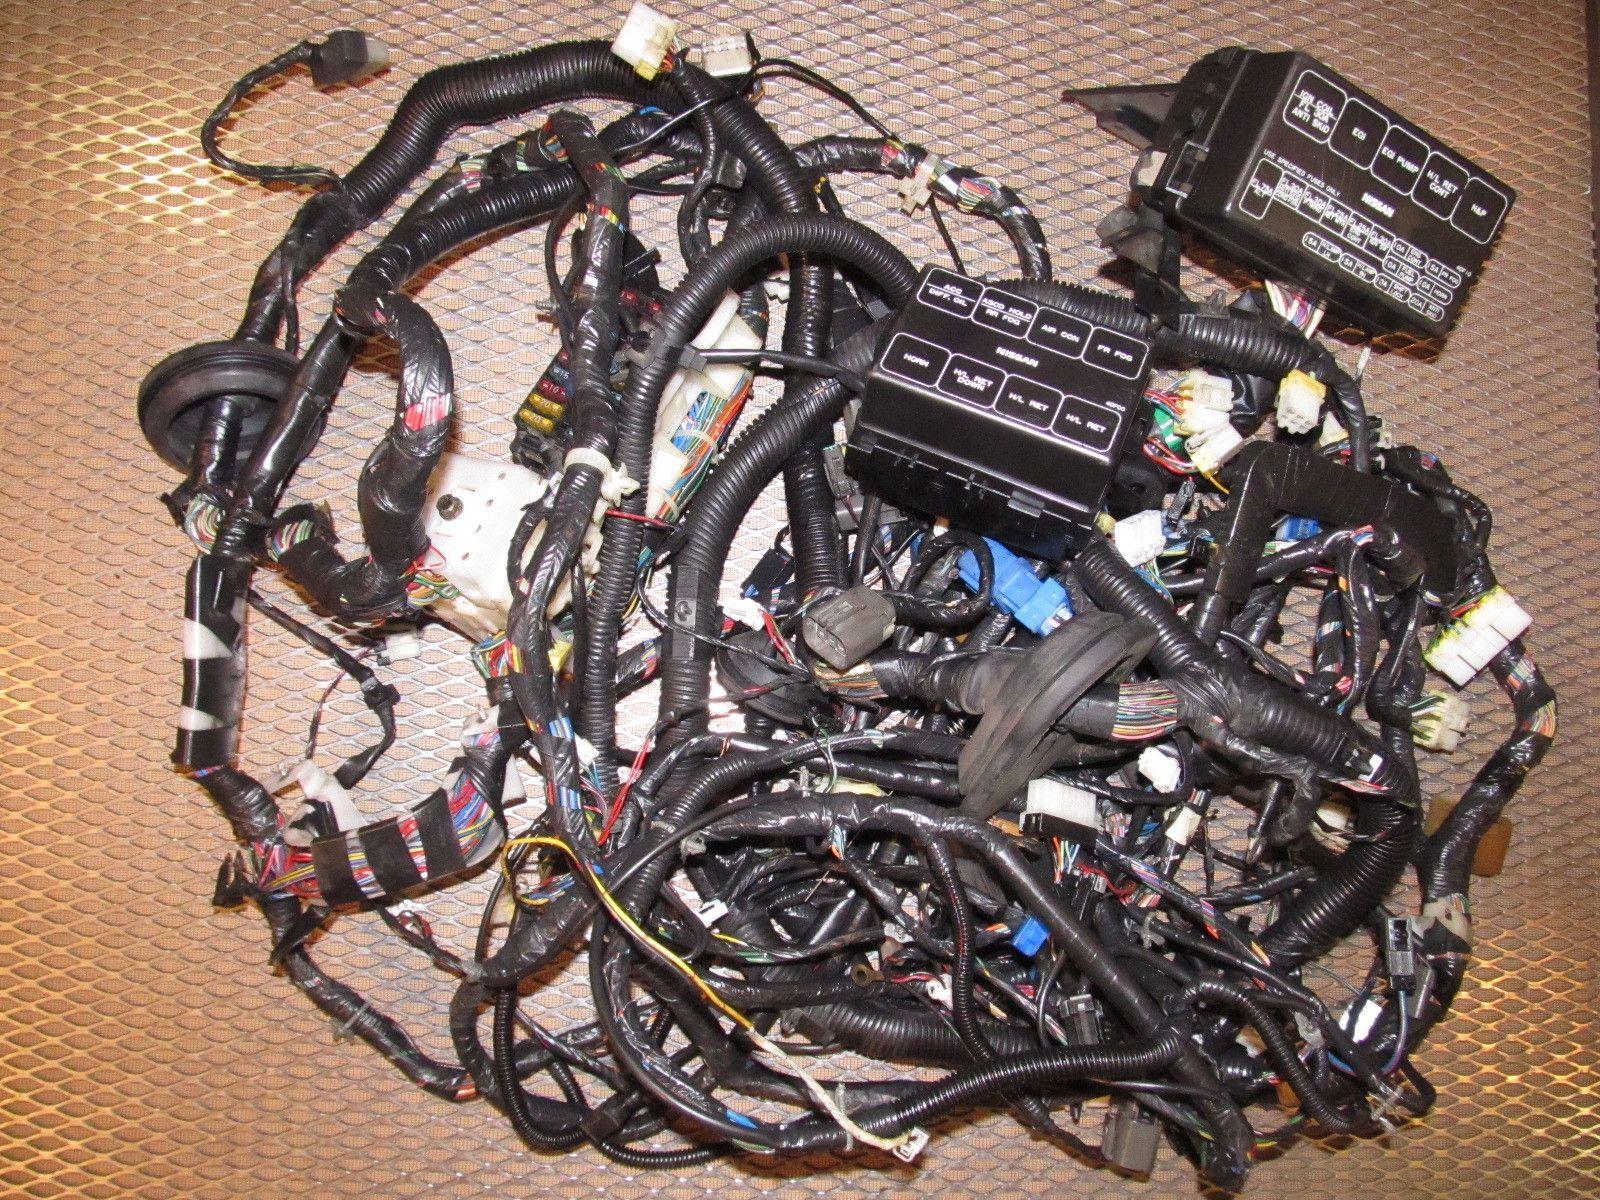 89 240sx fuse box wiring diagram technic240sx fuse box wiring library89 90 nissan 240sx oem fuse [ 1600 x 1200 Pixel ]